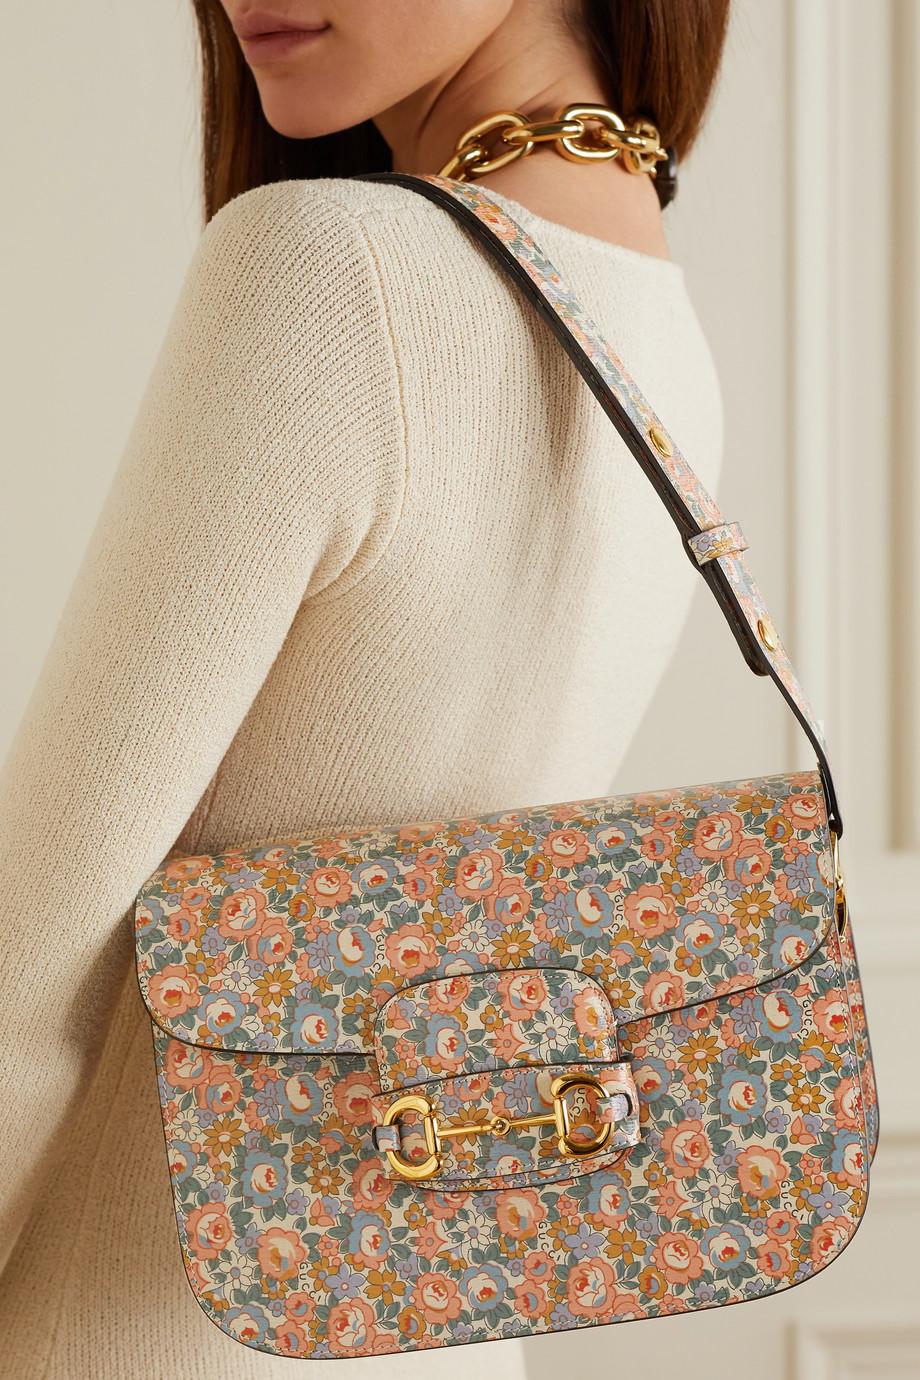 Gucci 1955 Horsebit 花卉印花纹理皮革小号单肩包